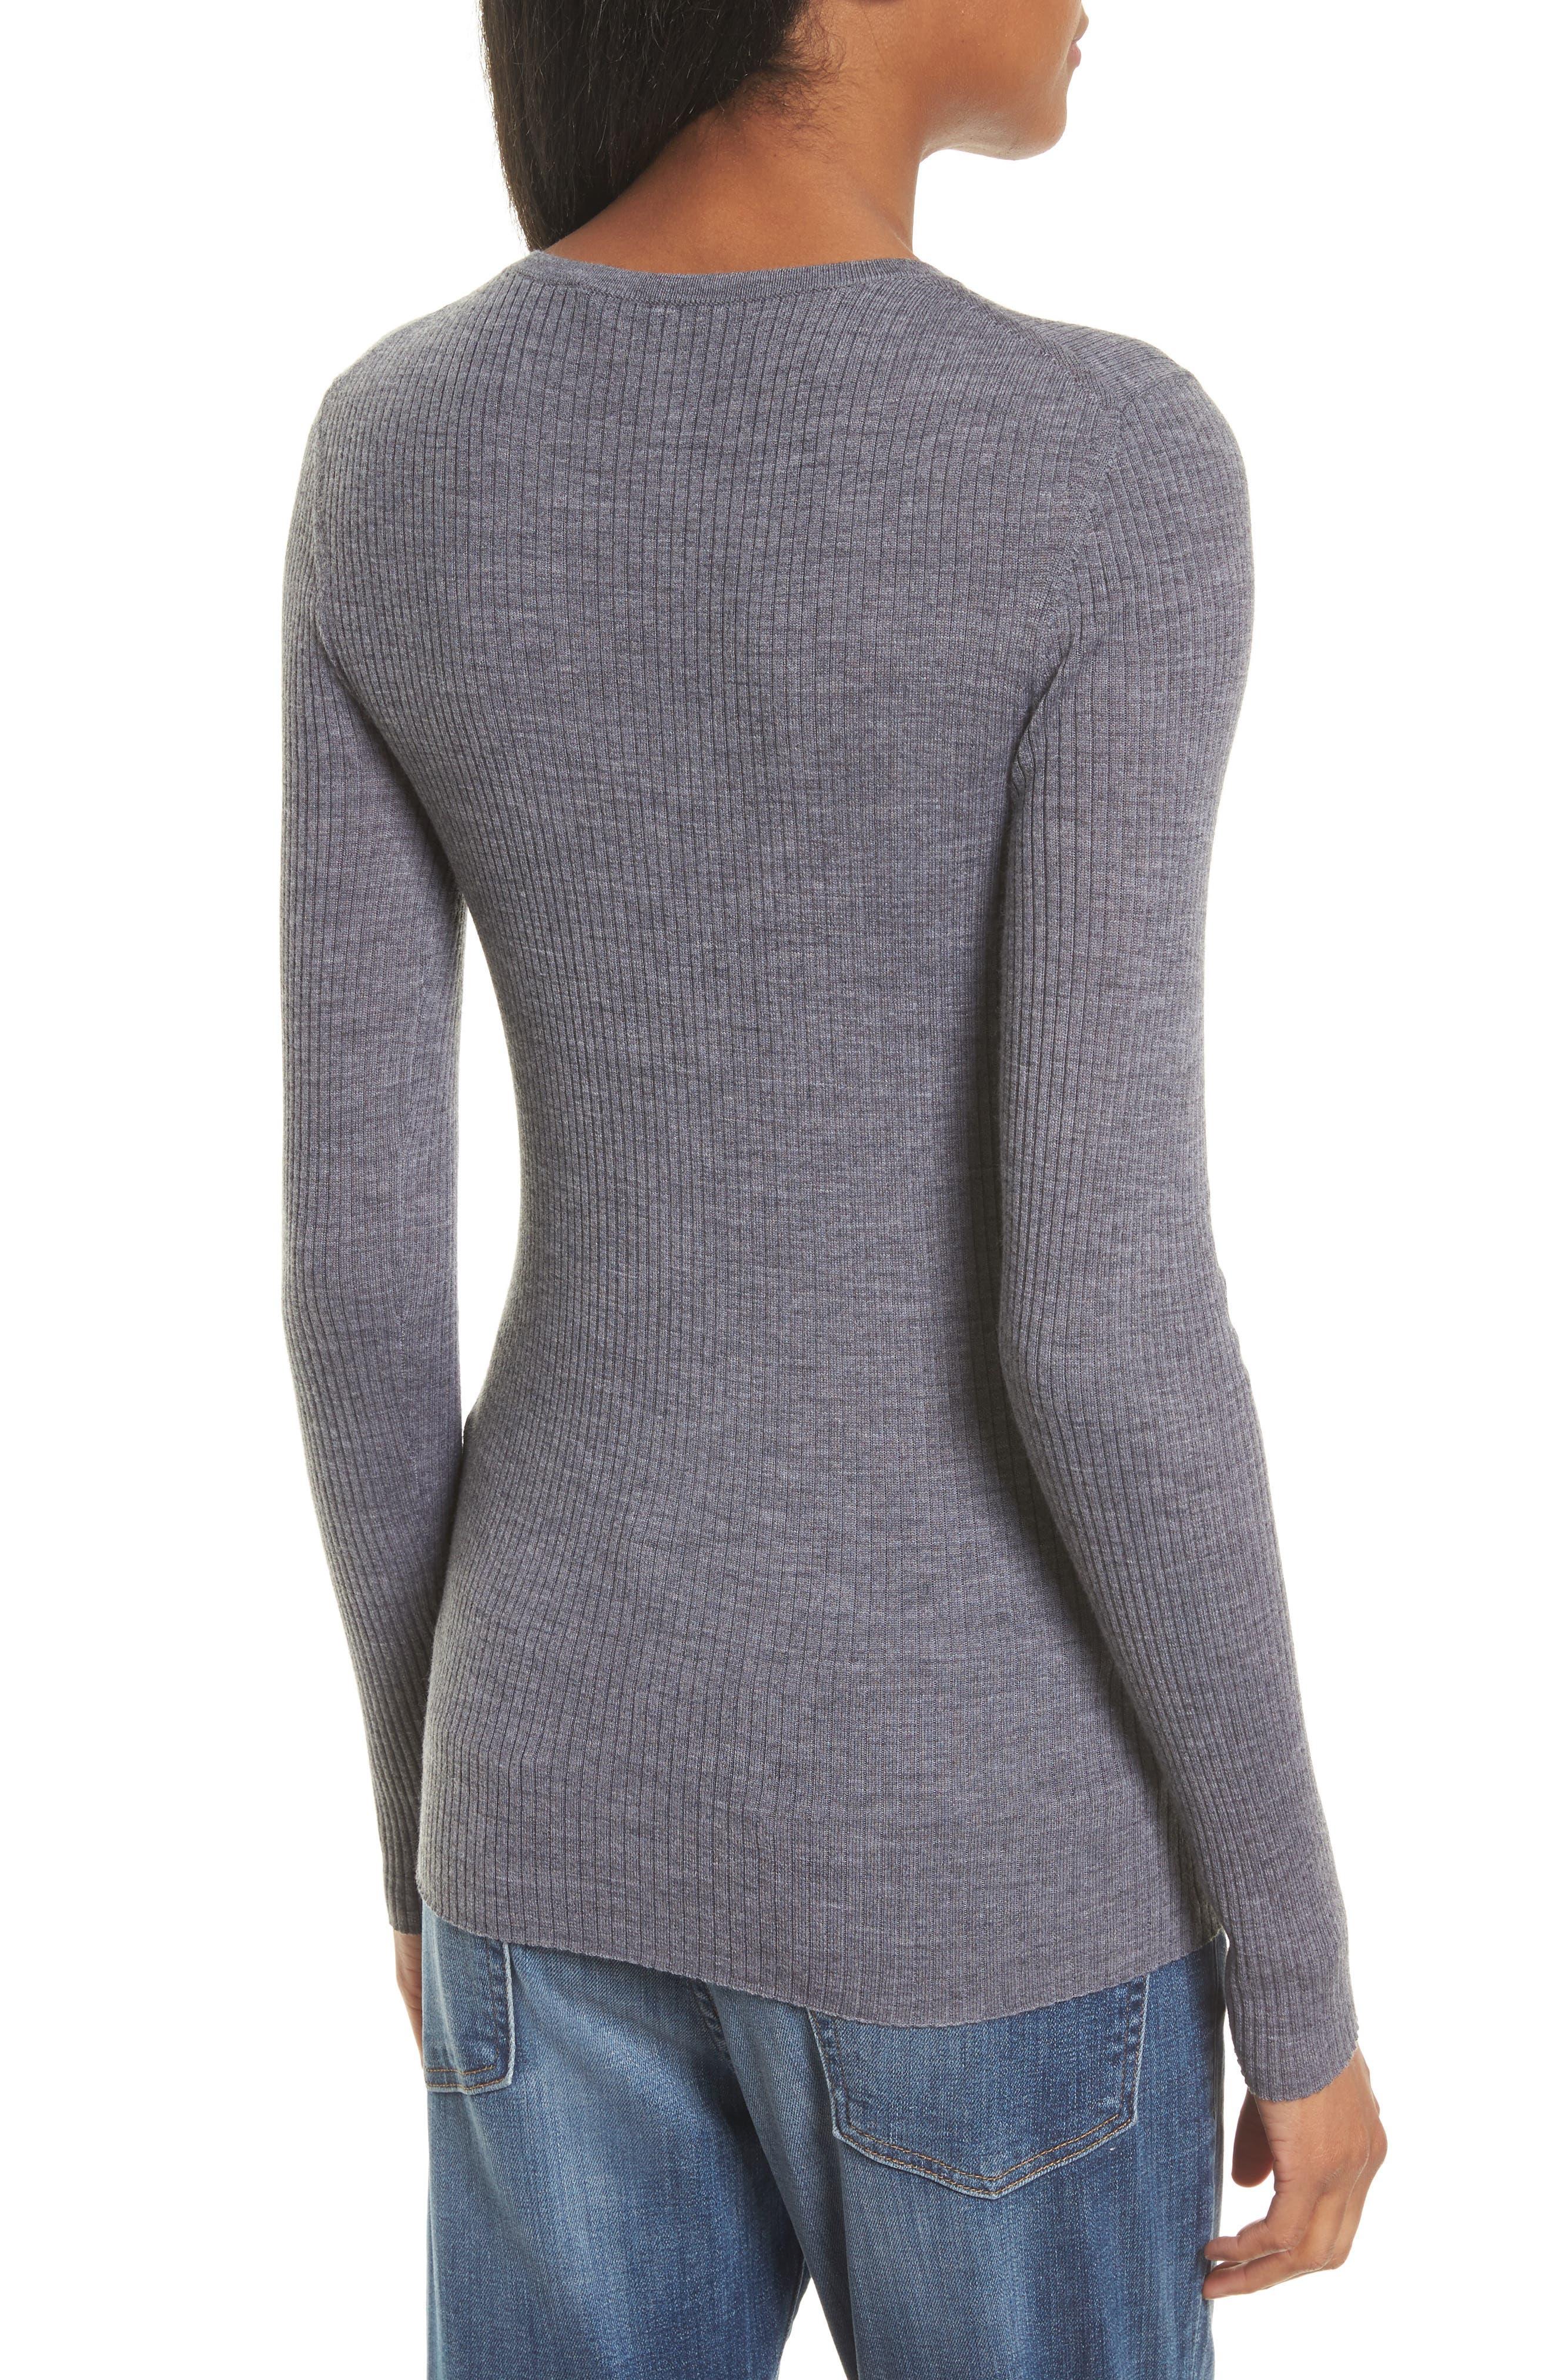 Mirzi B Merino Wool Sweater,                             Alternate thumbnail 2, color,                             059